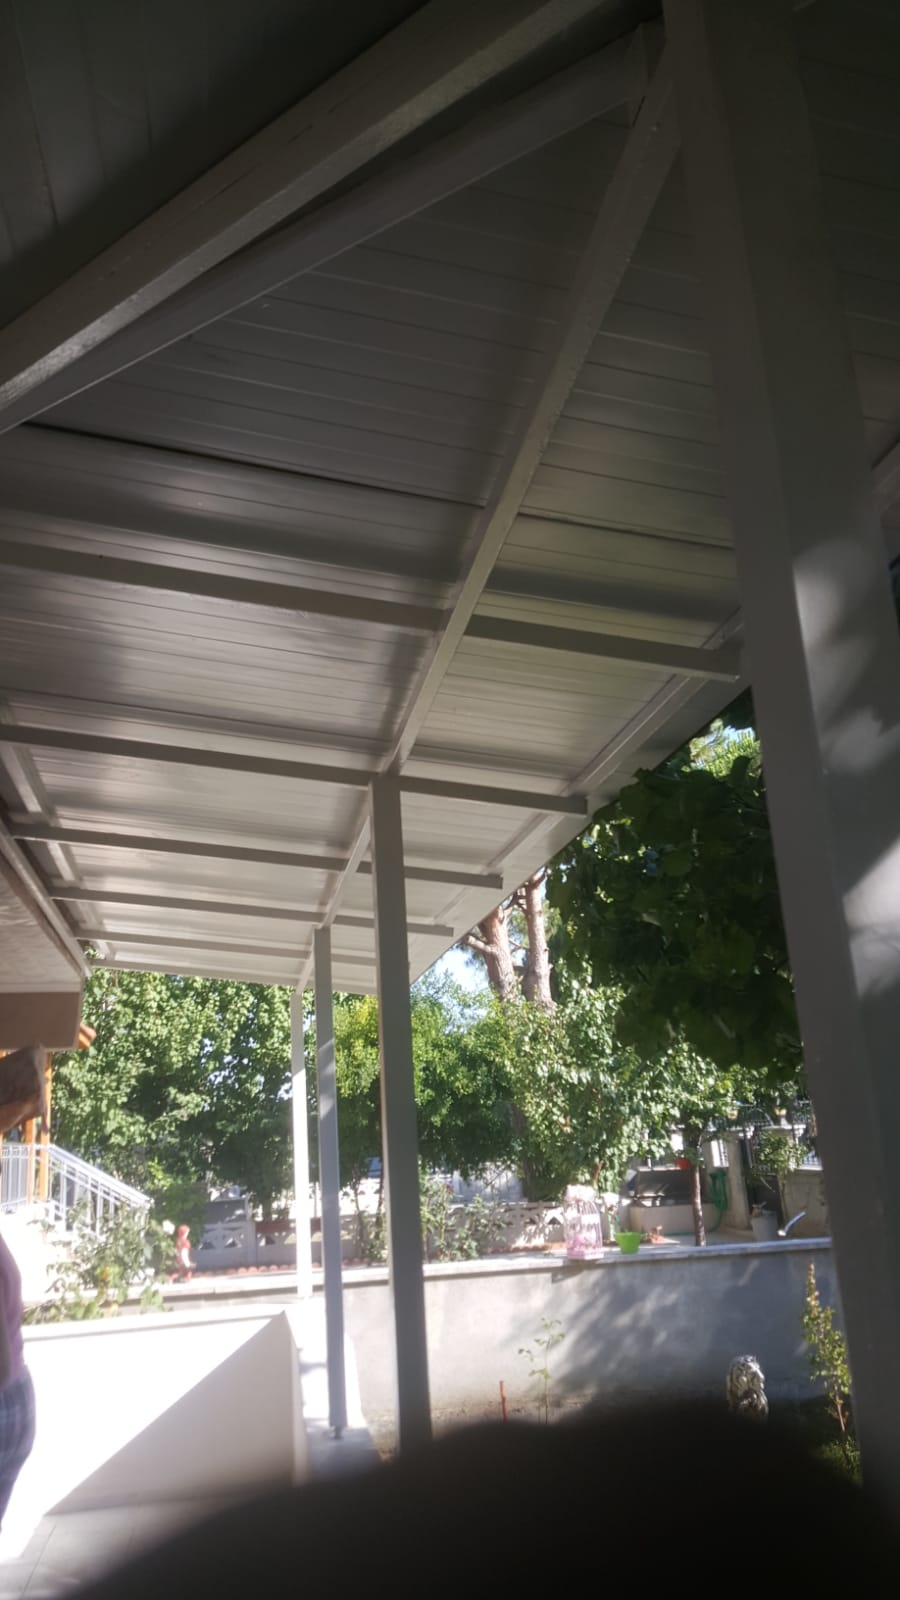 sandviç panel tavan kaplama kış bahçesi